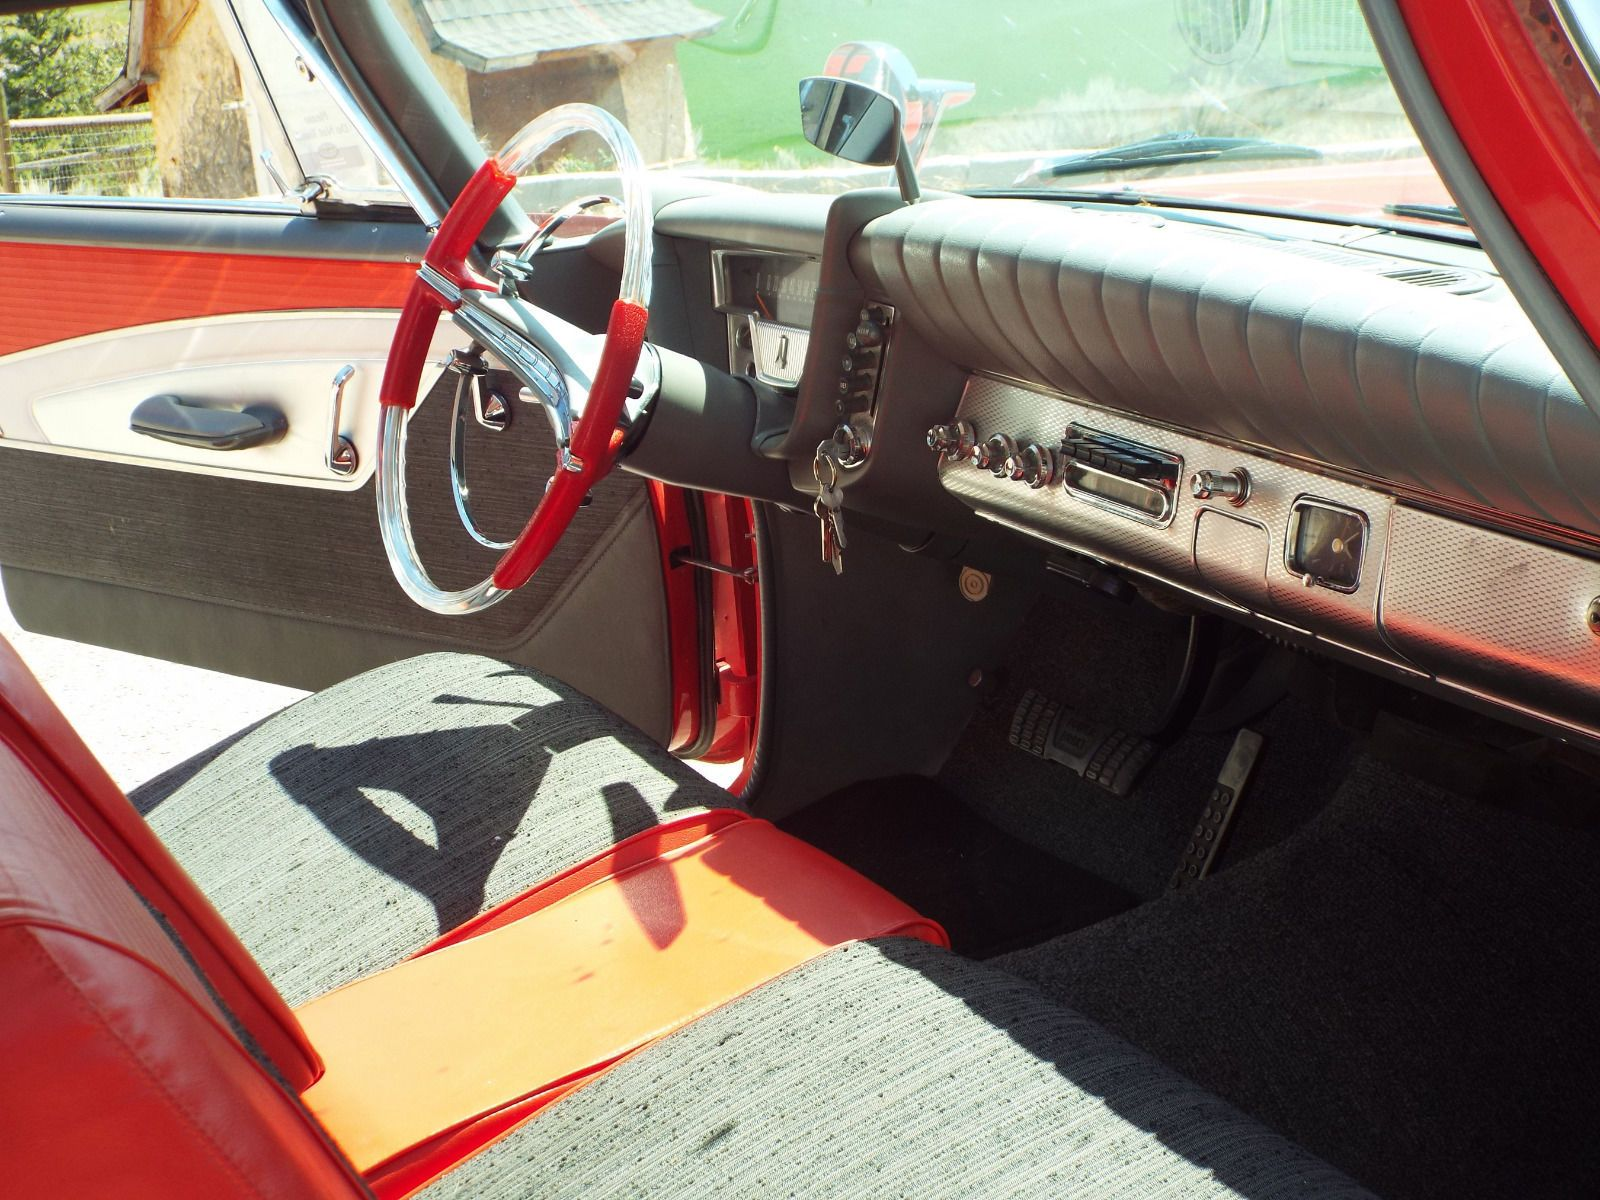 1960 plymouth interior | 1960 PLYMOUTH FURY Lot 990 | Barrett ...